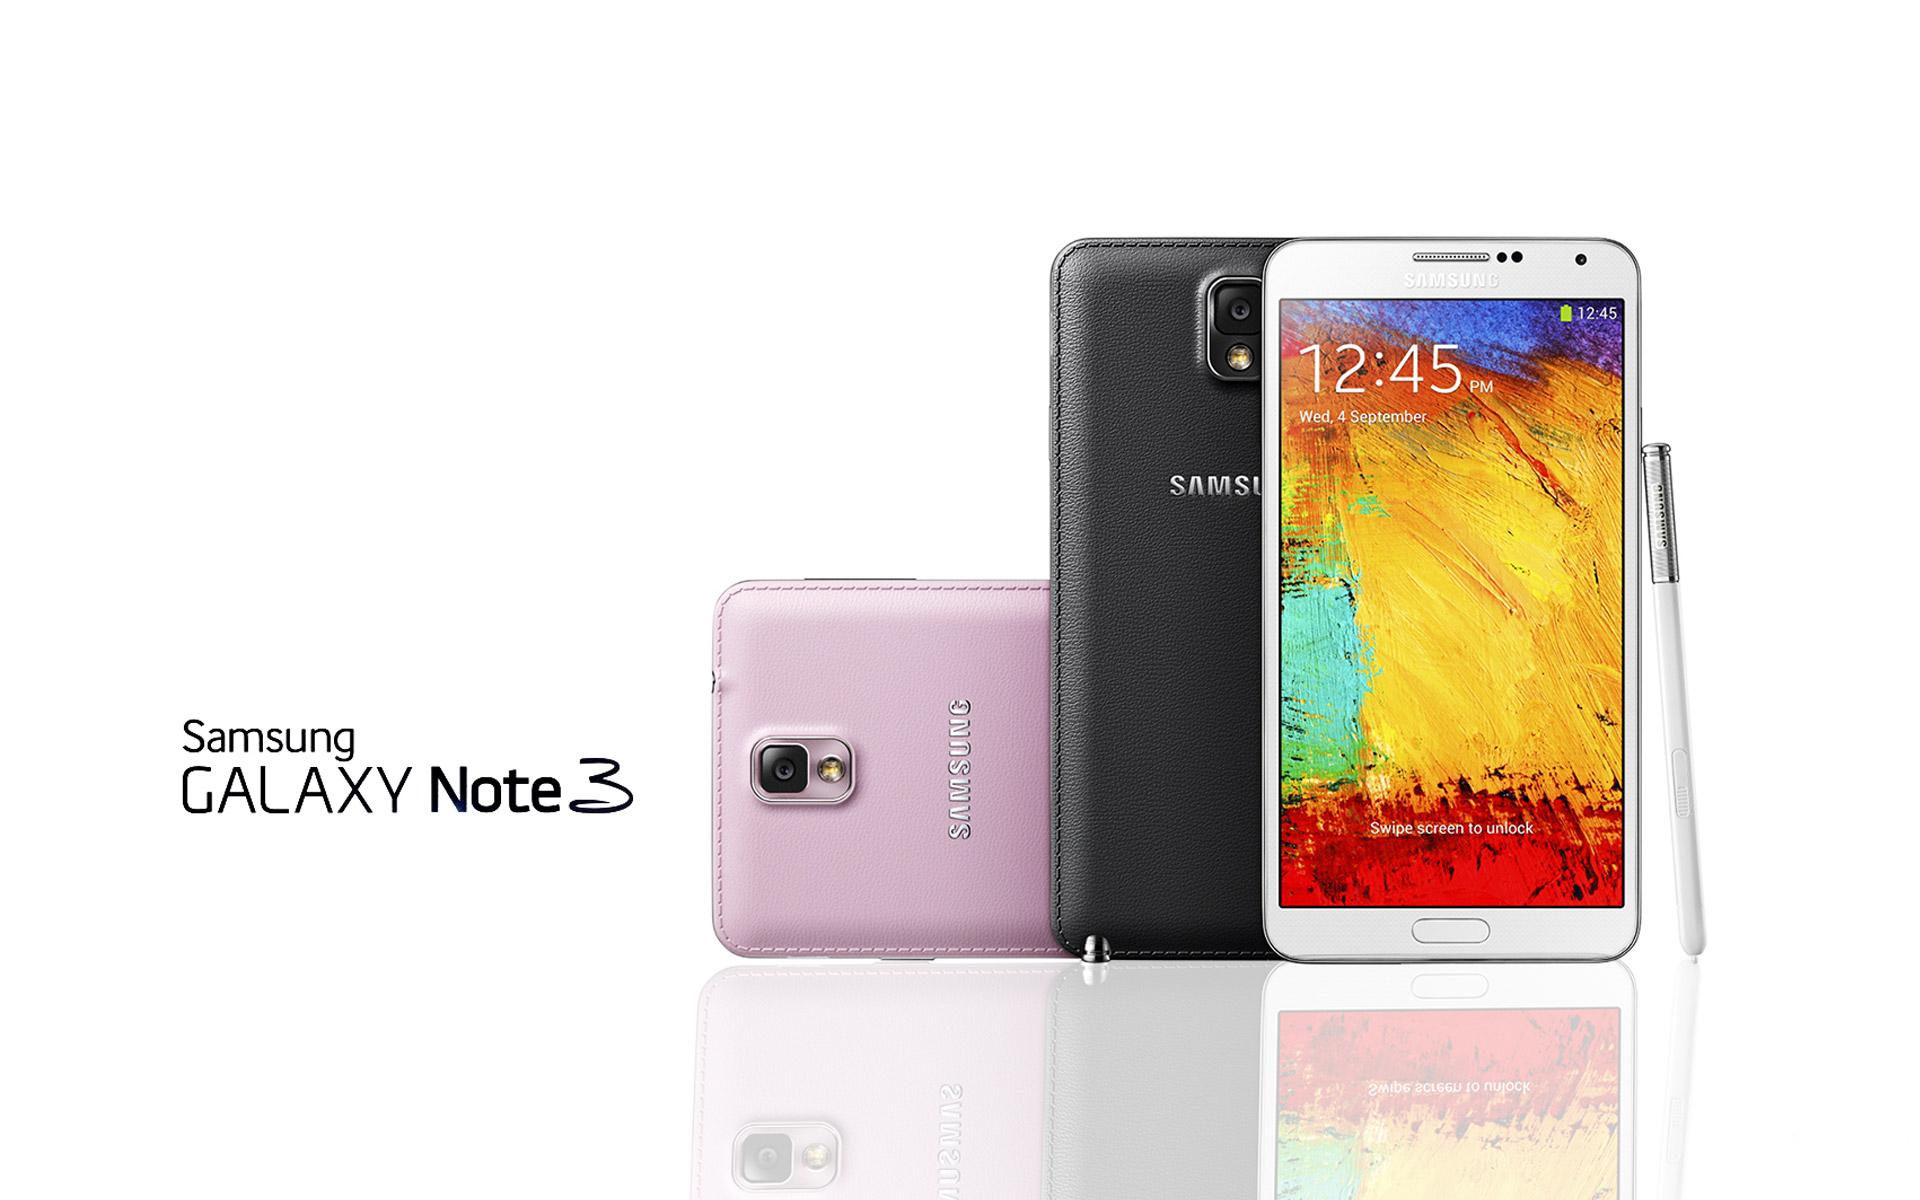 Samsung Galaxy Note 3 Wallpaper